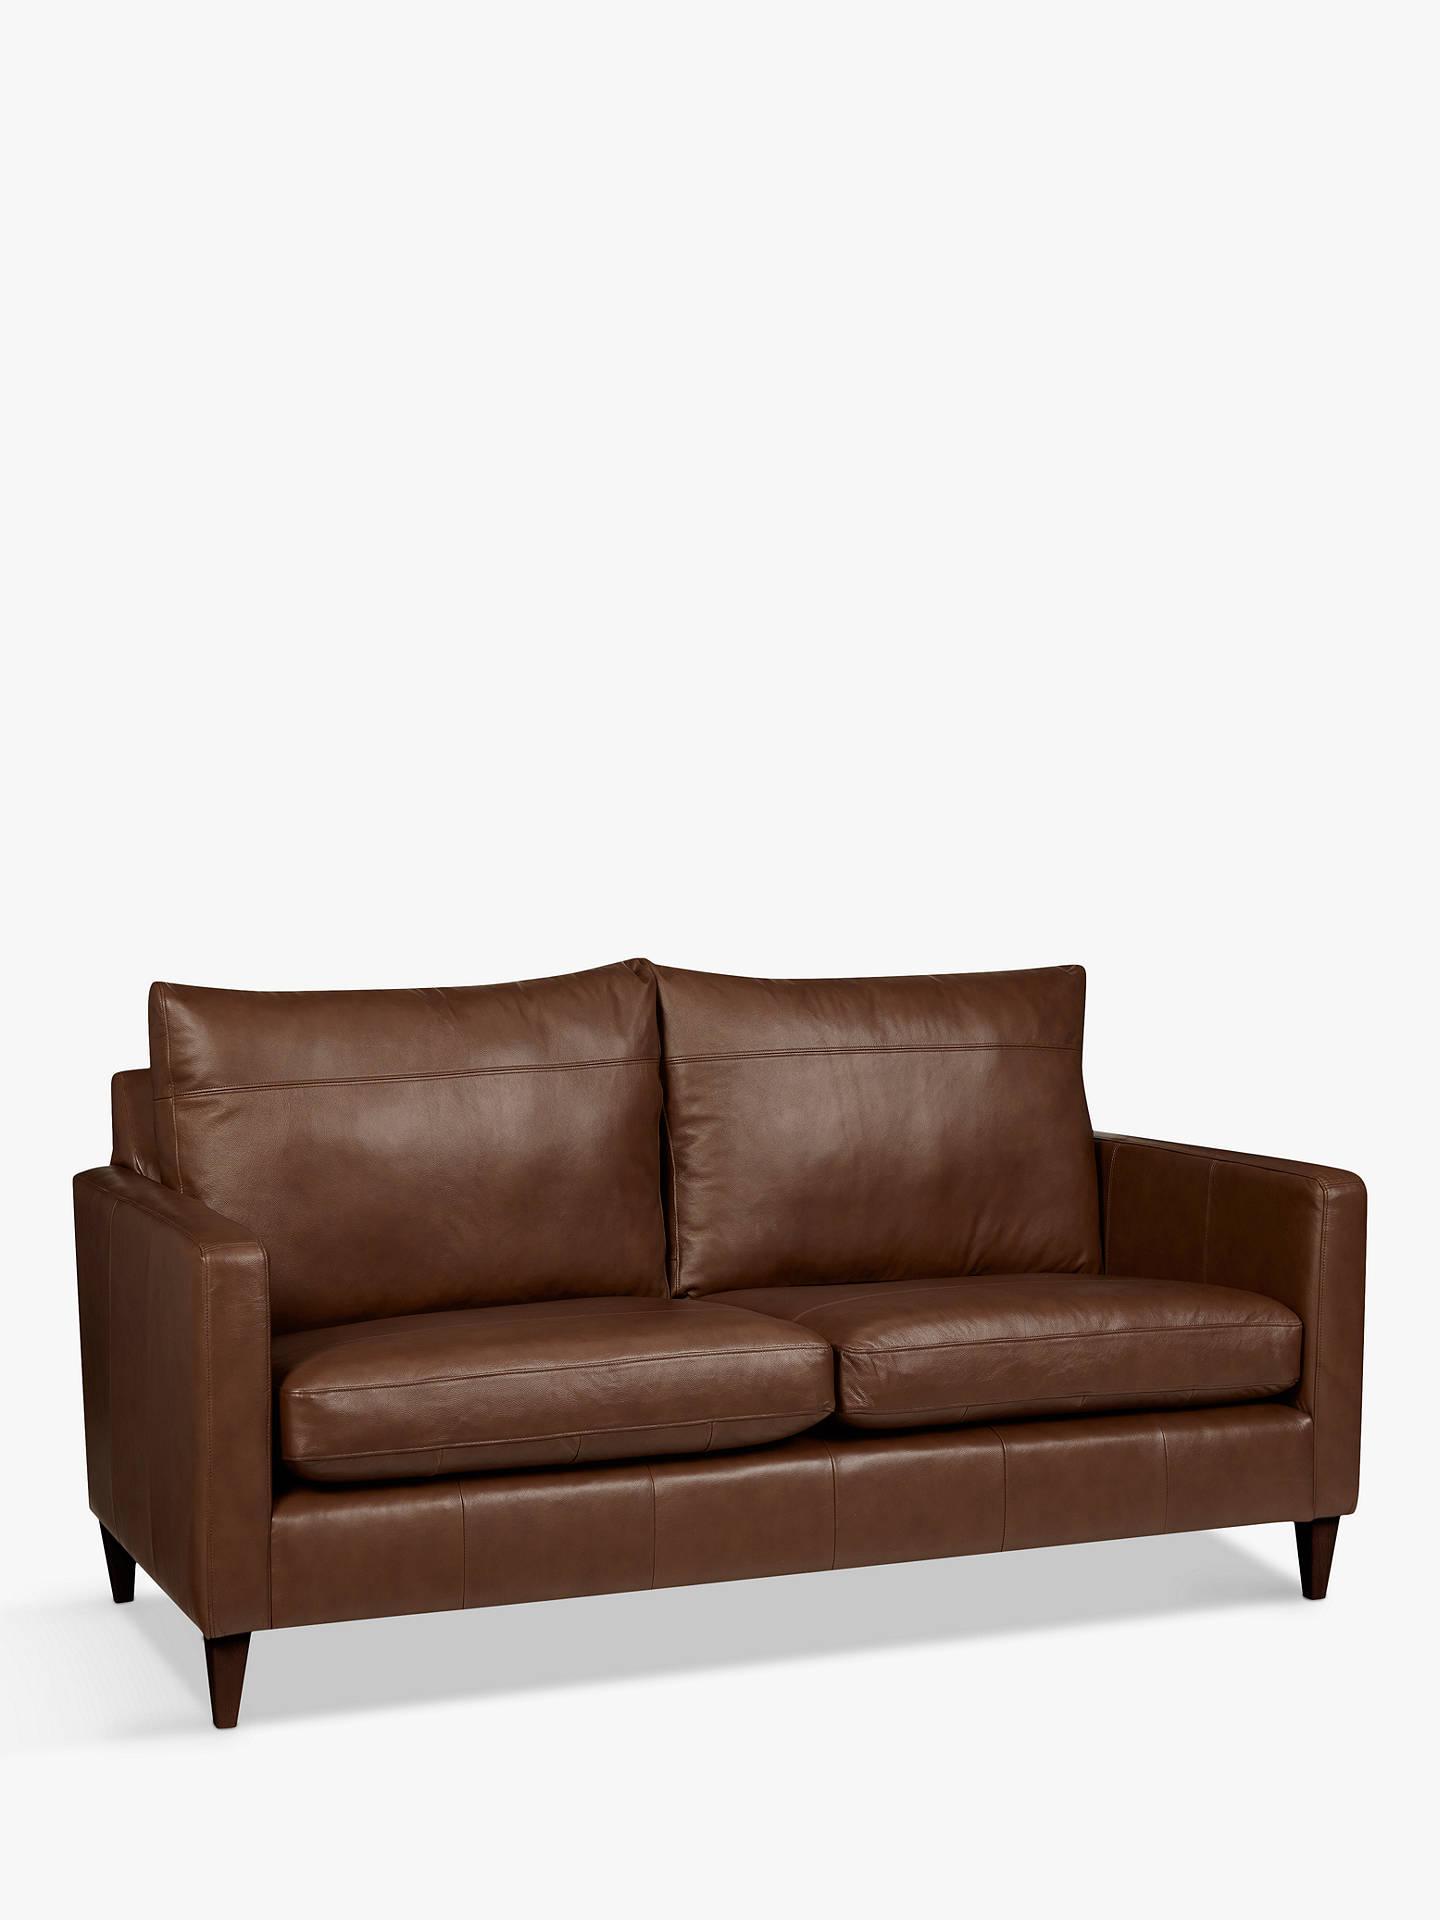 John Lewis Partners Bailey Leather Medium 2 Seater Sofa Dark Leg Milan Chestnut